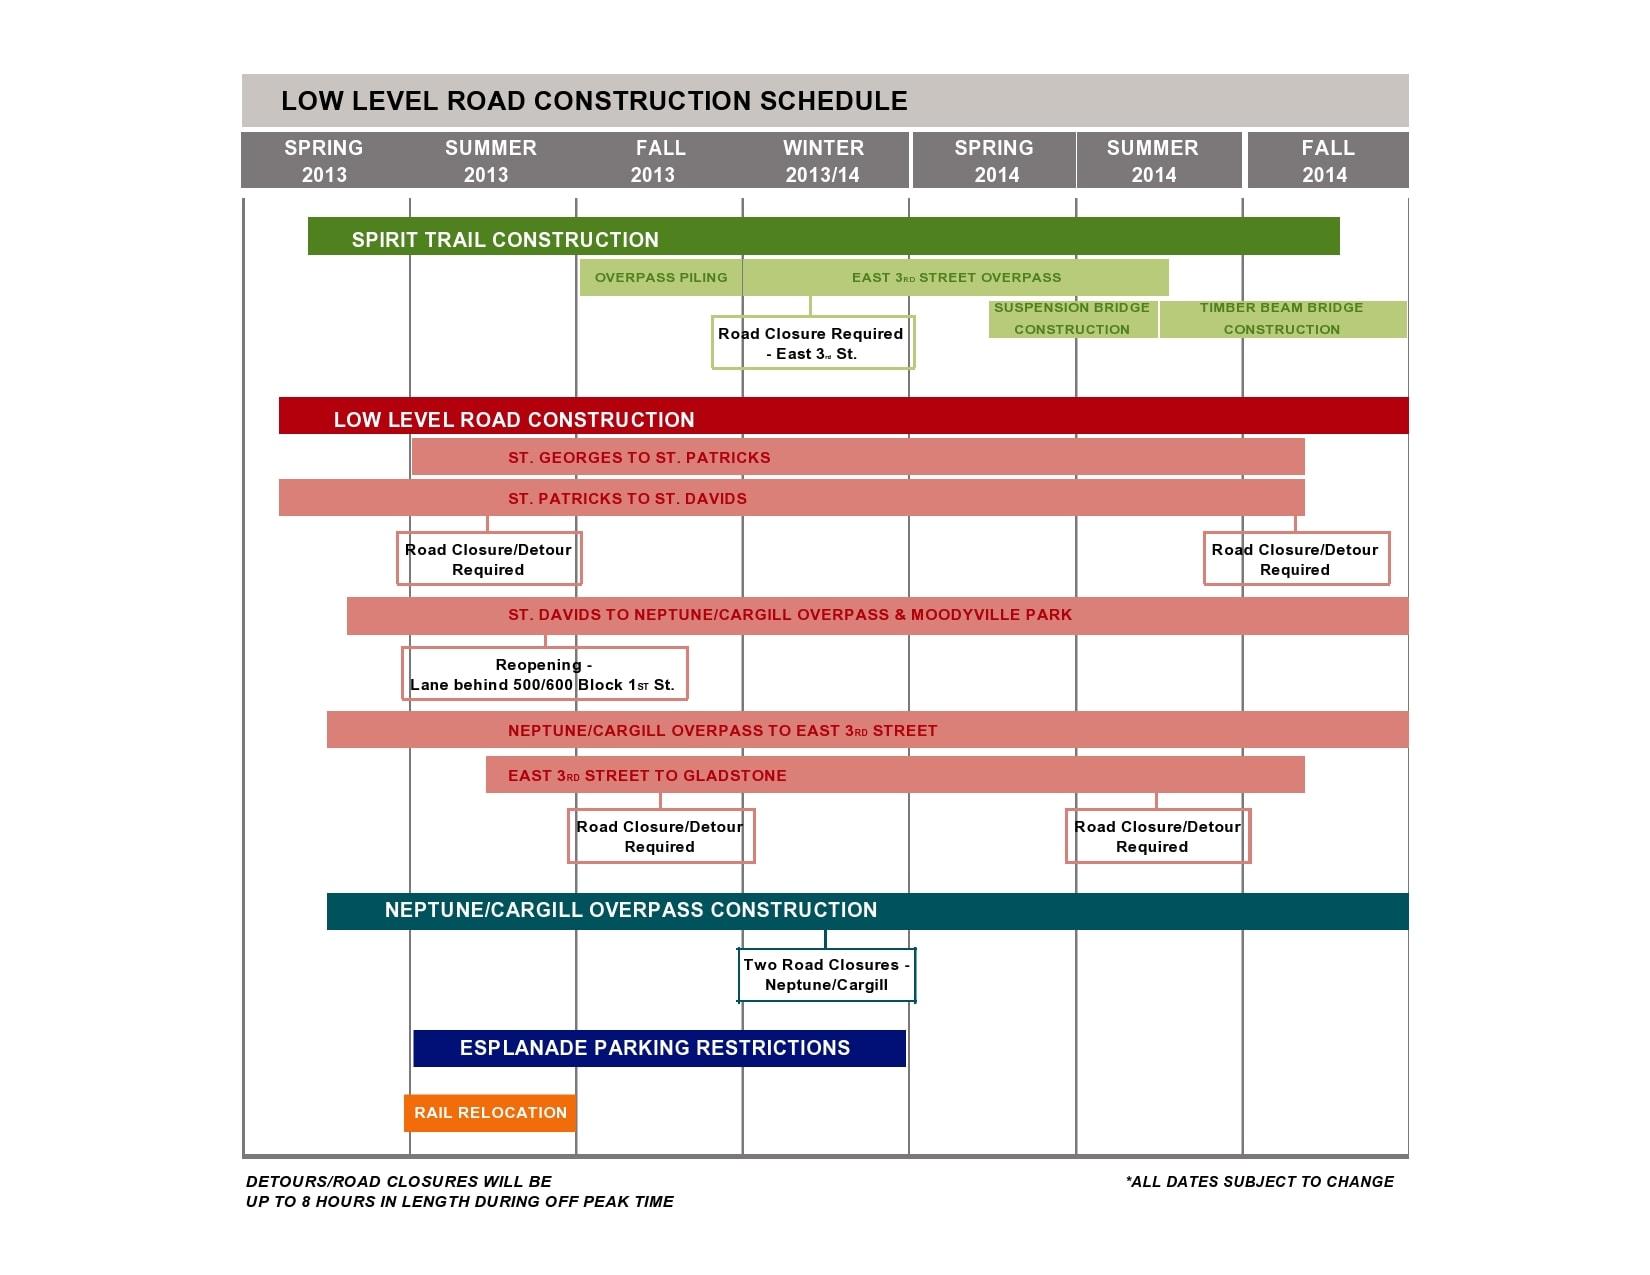 construction schedule 18